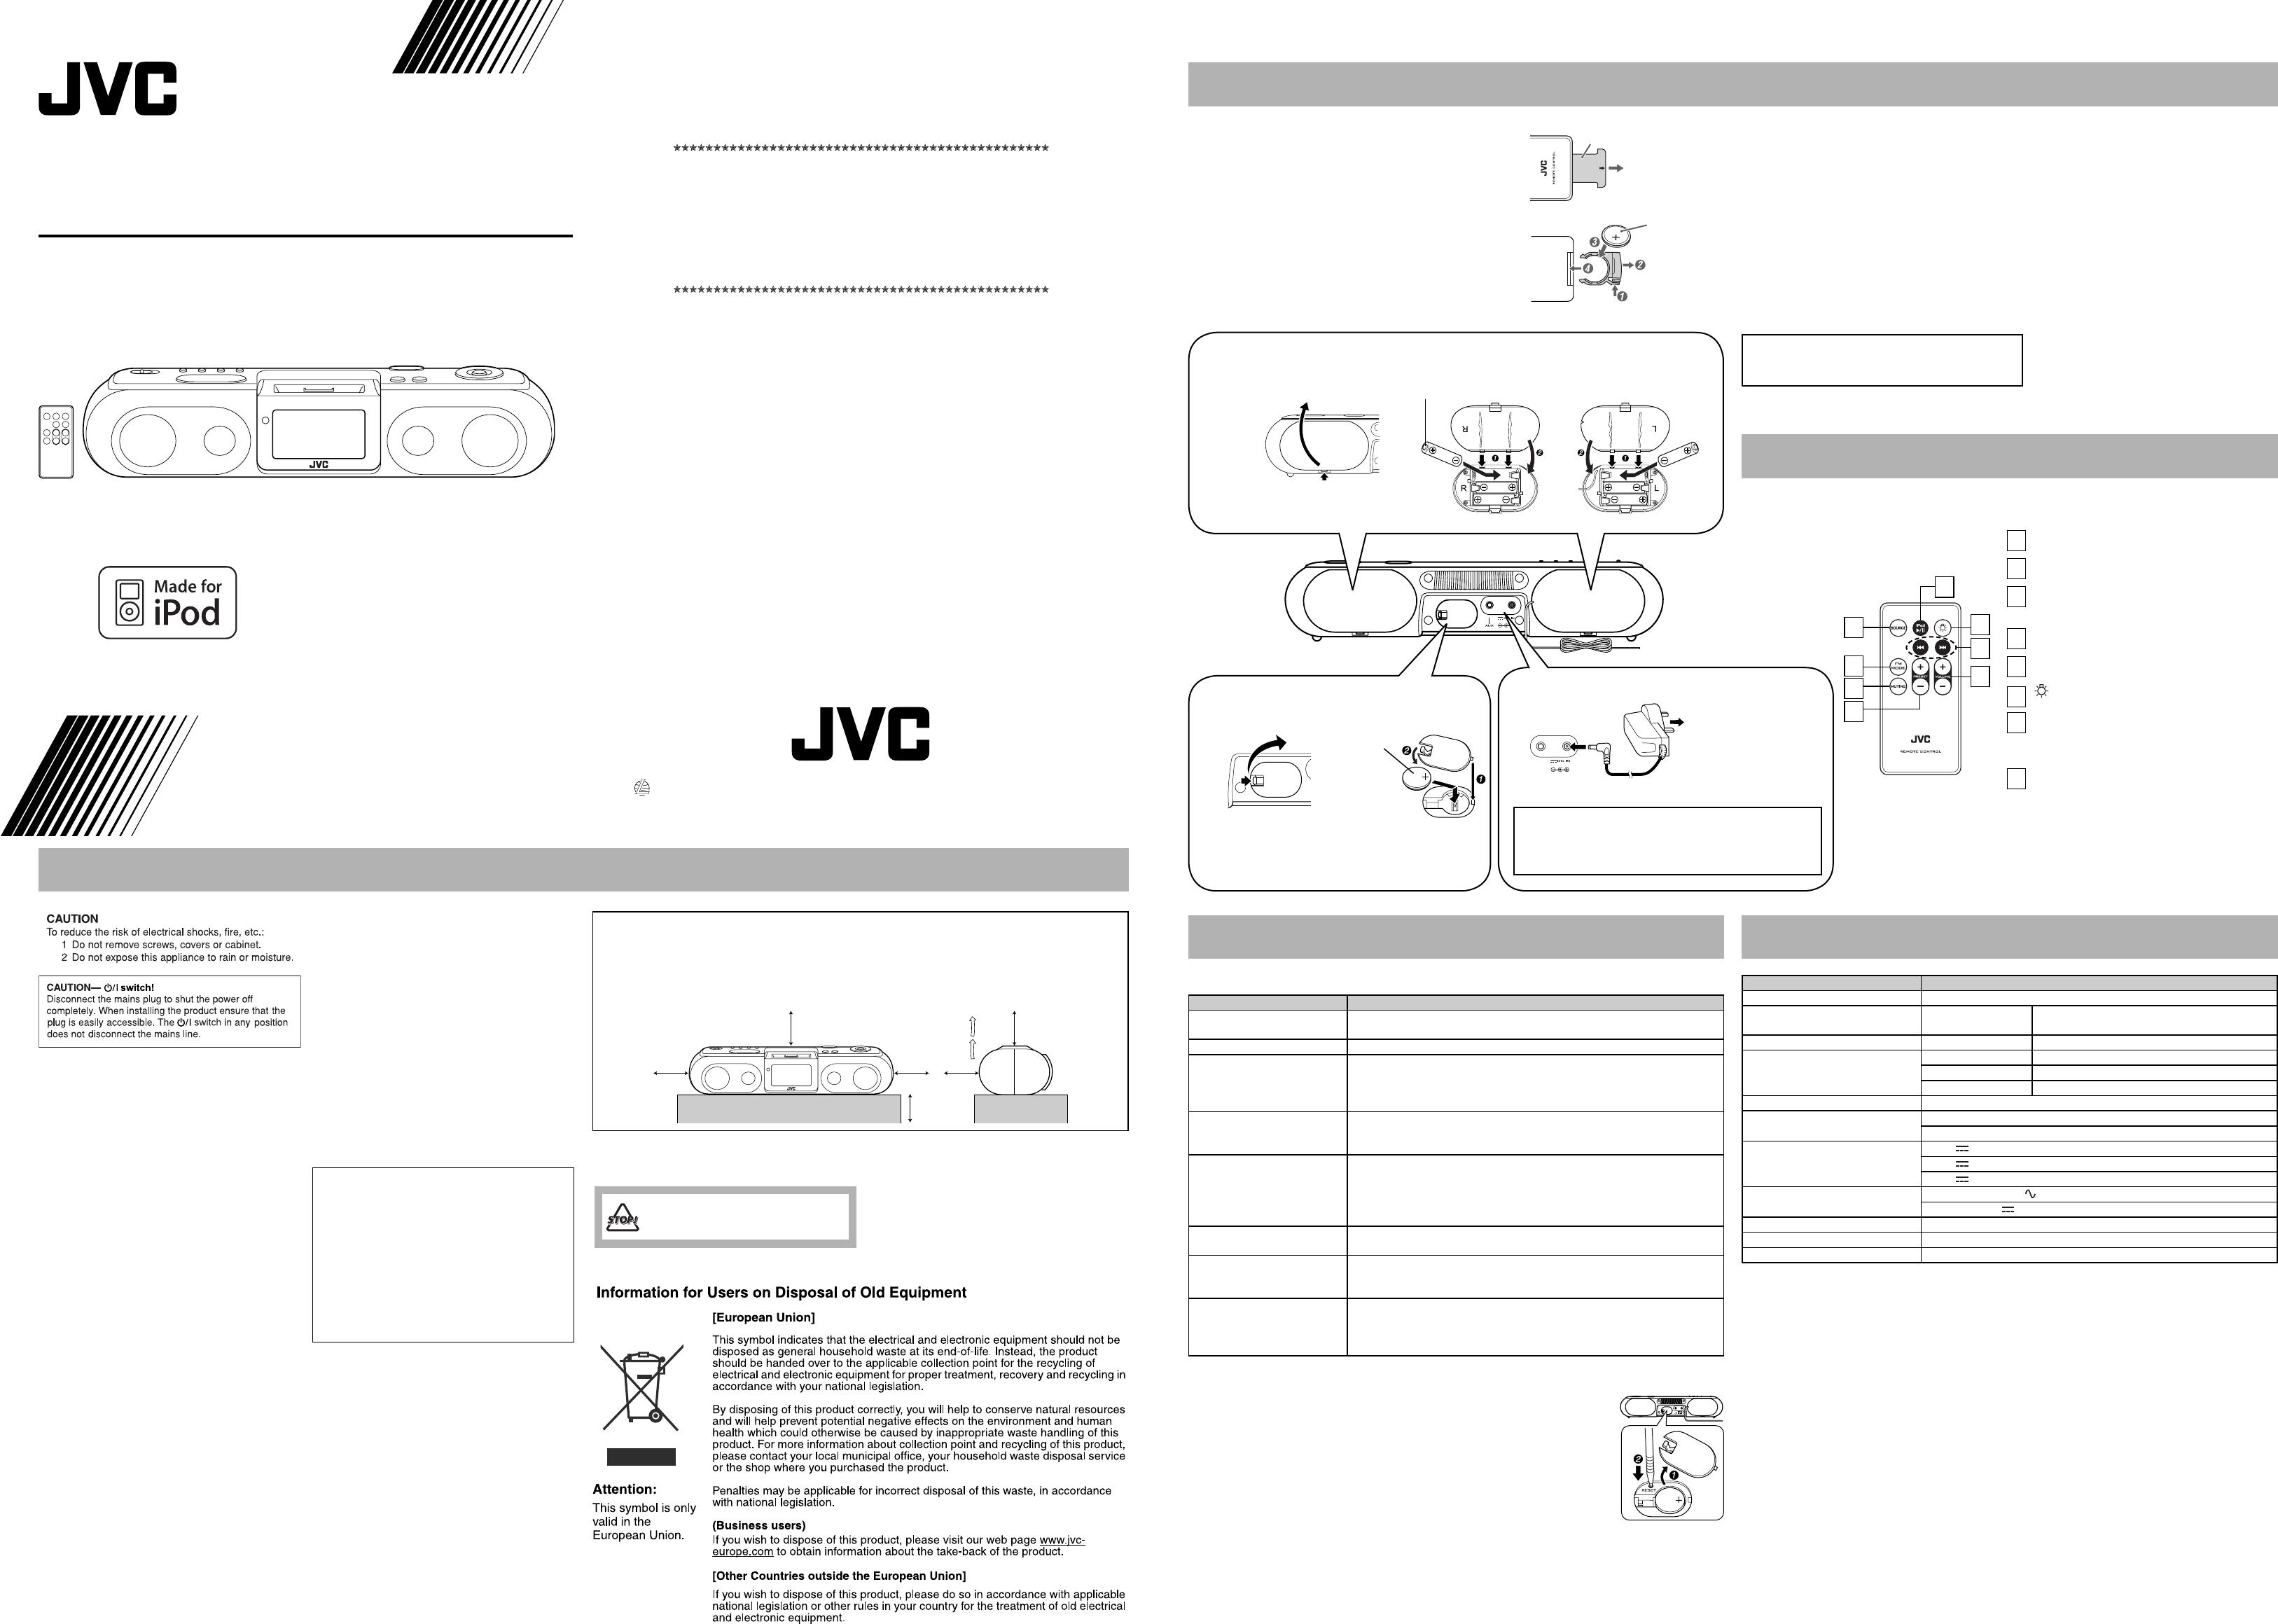 Handleiding jvc ra p11 pagina 1 van 2 english buycottarizona